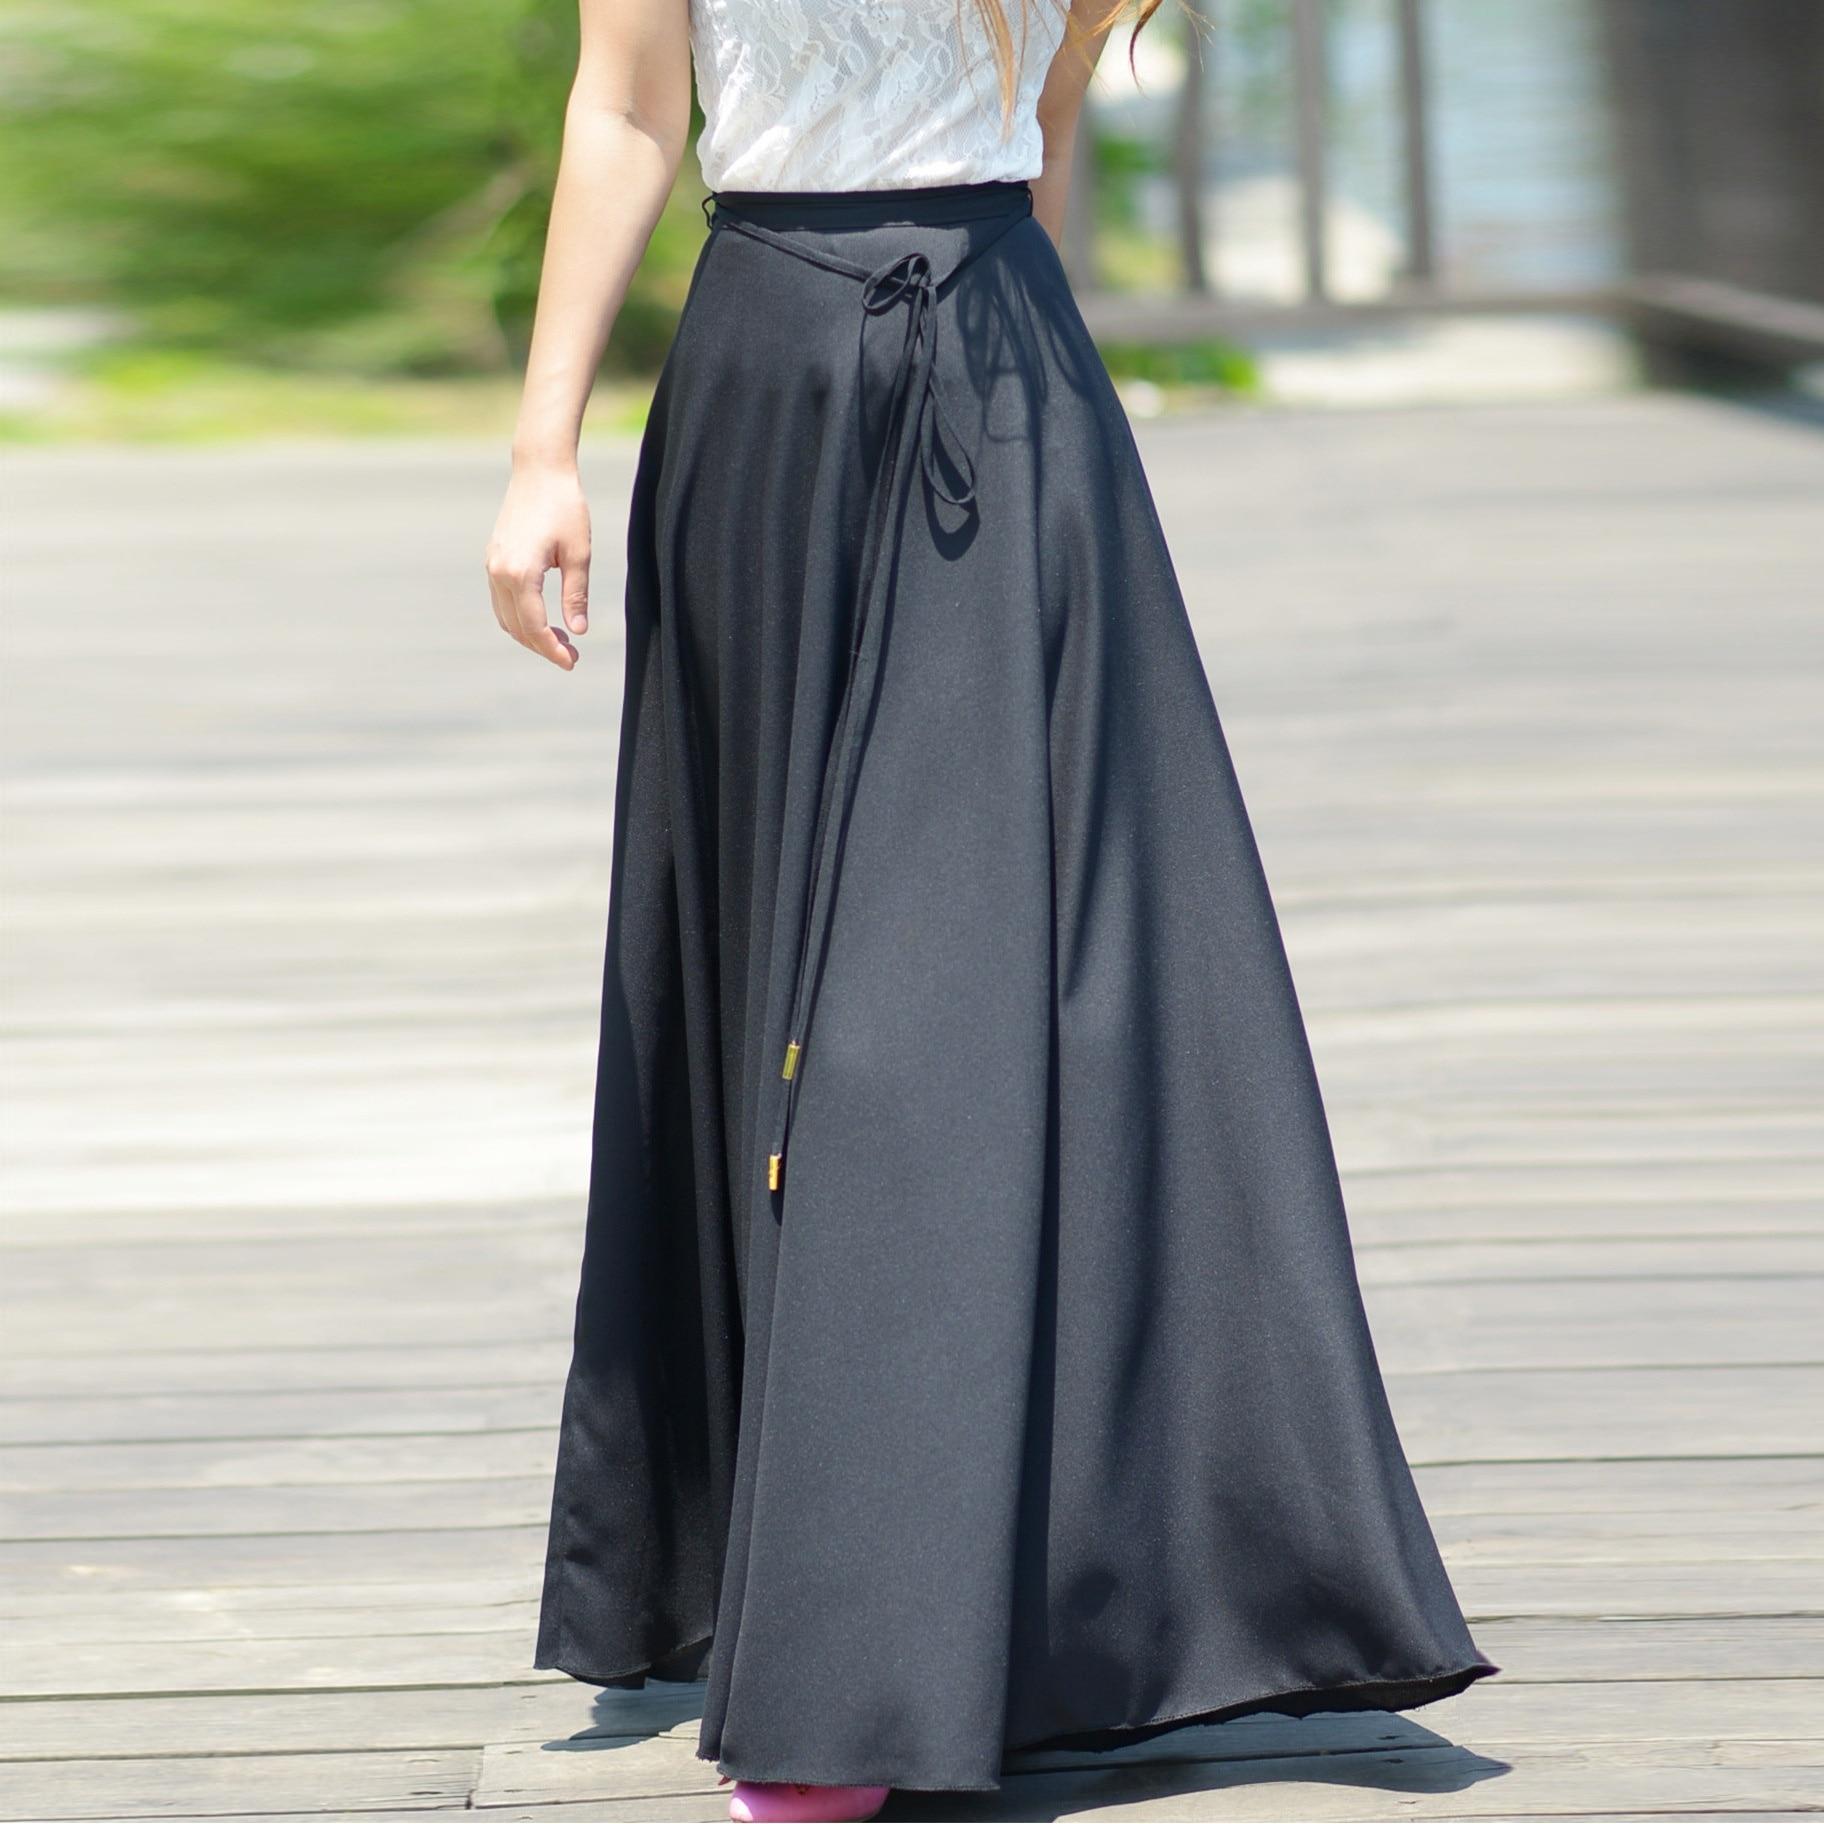 Womens Thick Chiffon Retro Long Maxi Skirt Vintage Spring Summer Autumn All-Match High-quality Maxi Large Pendulum Skirt